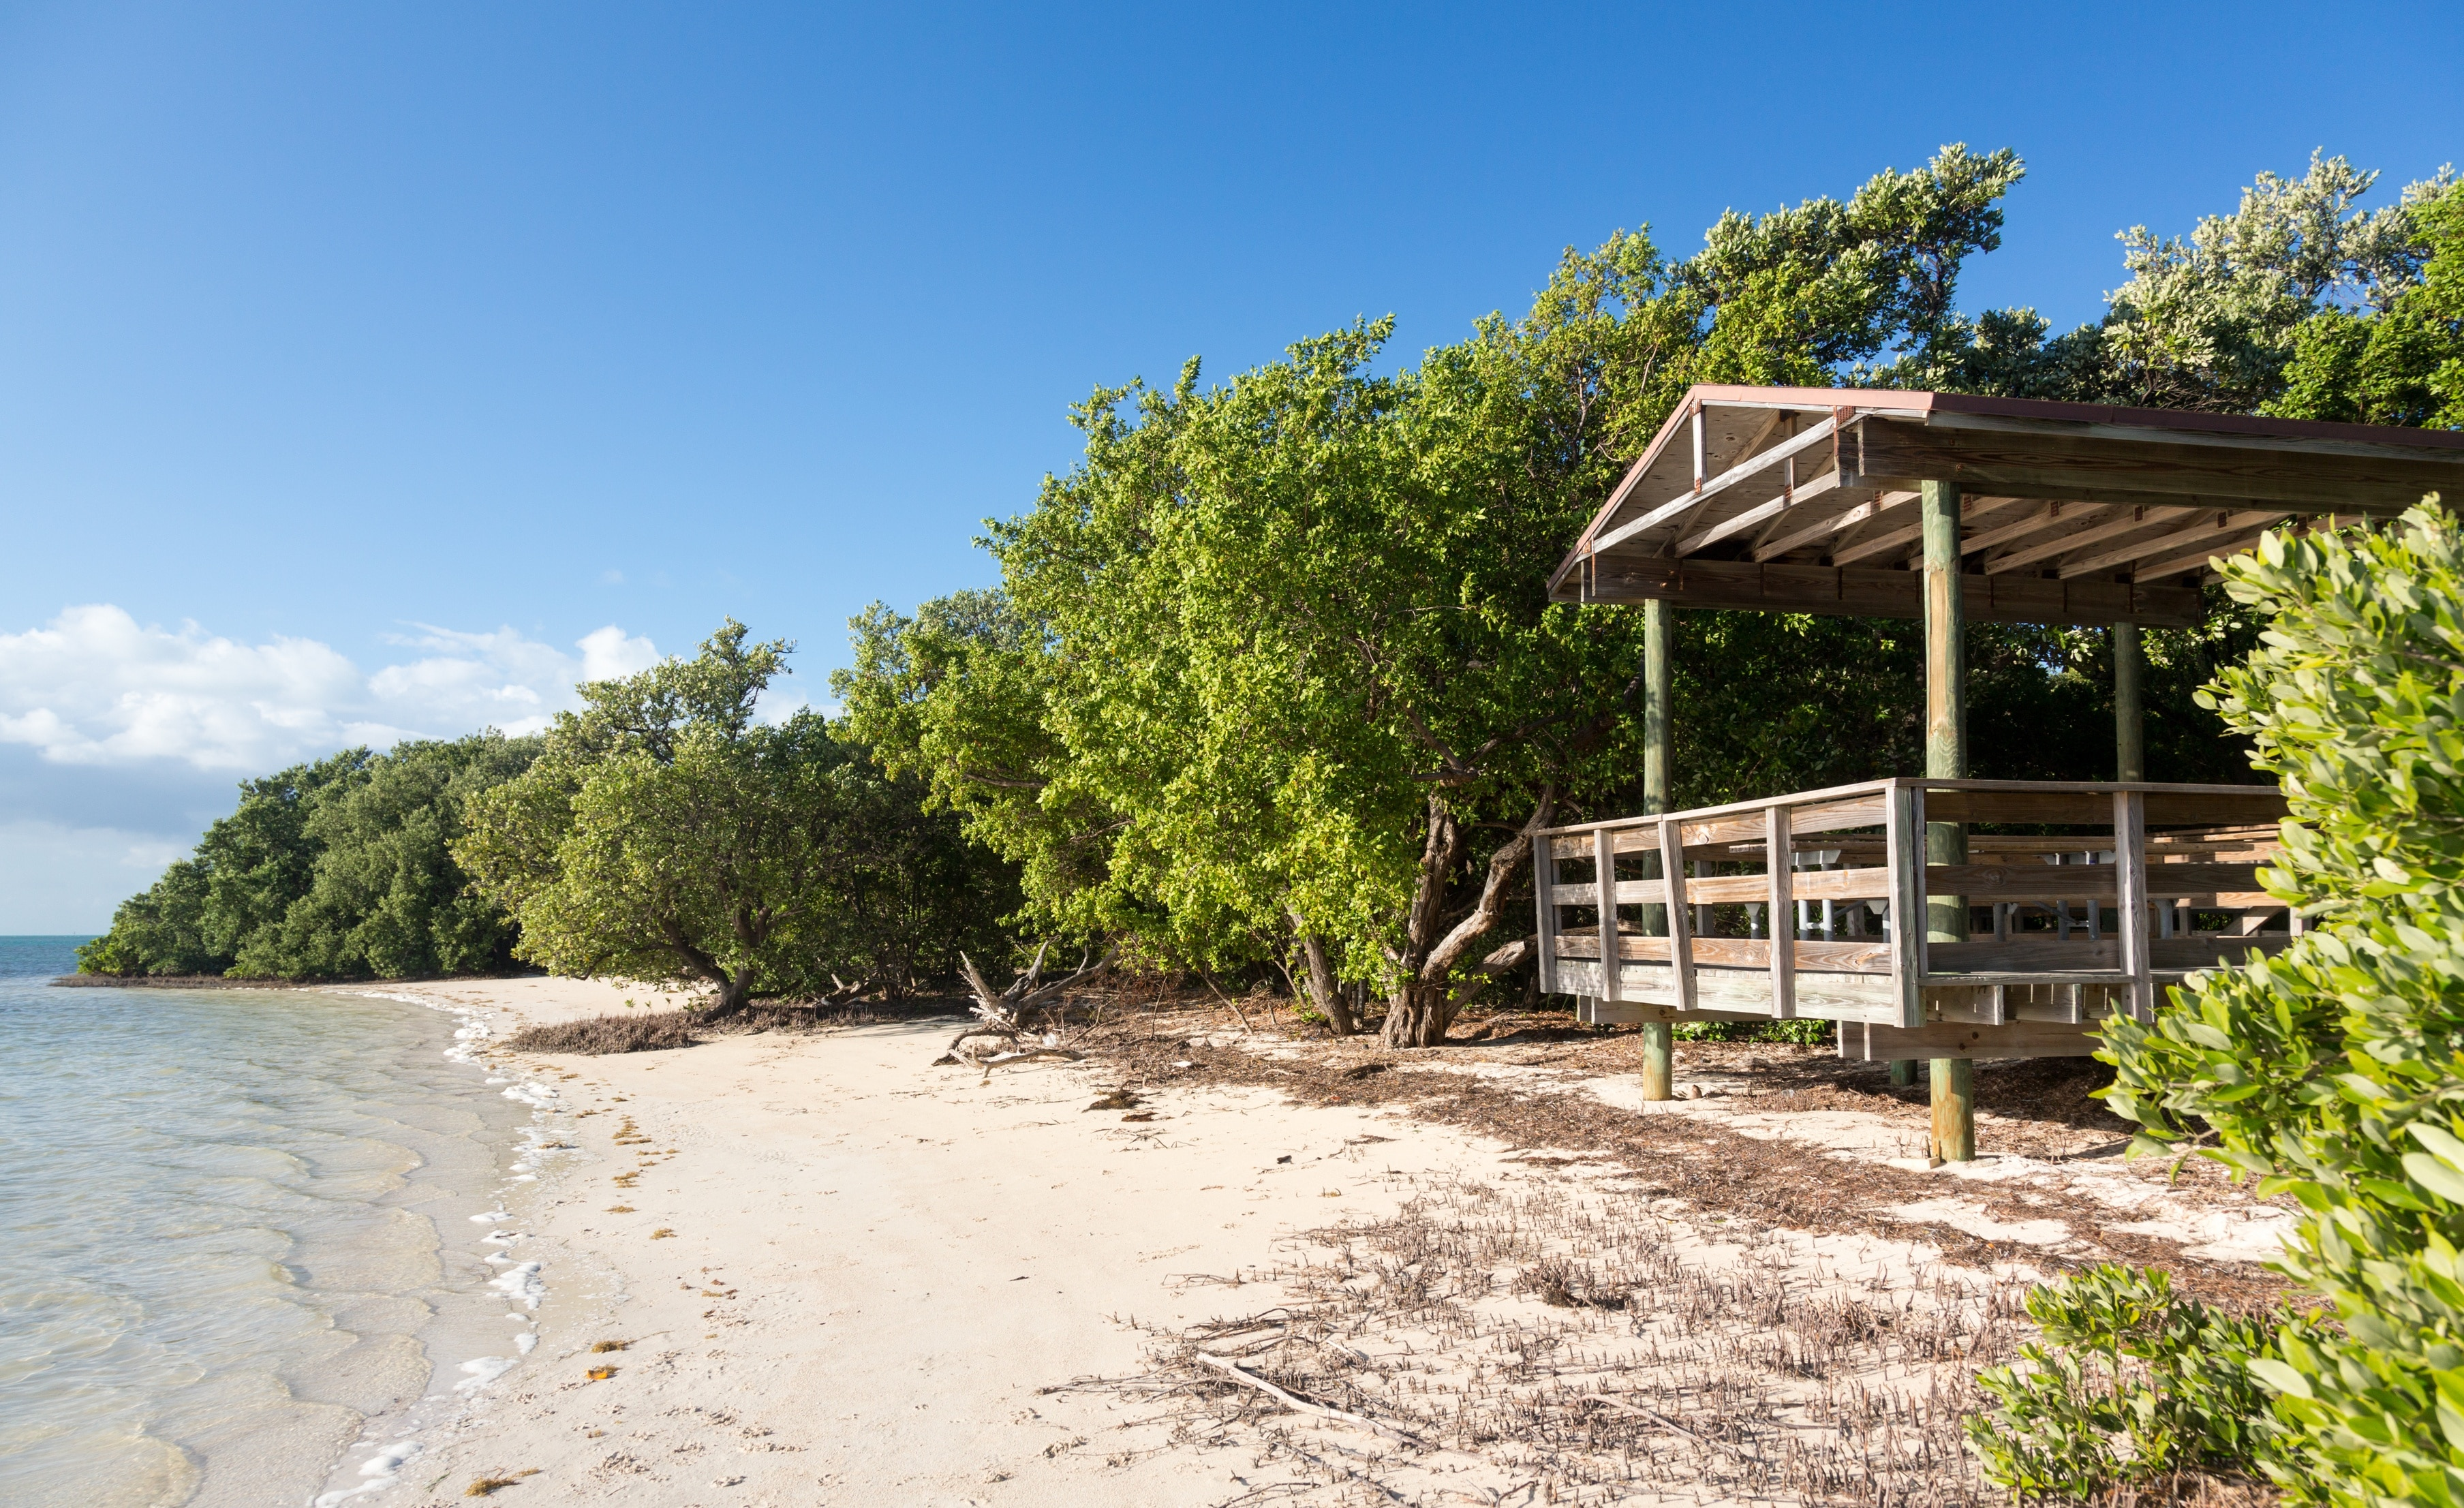 Lower Matecumbe Key, Florida, United States of America